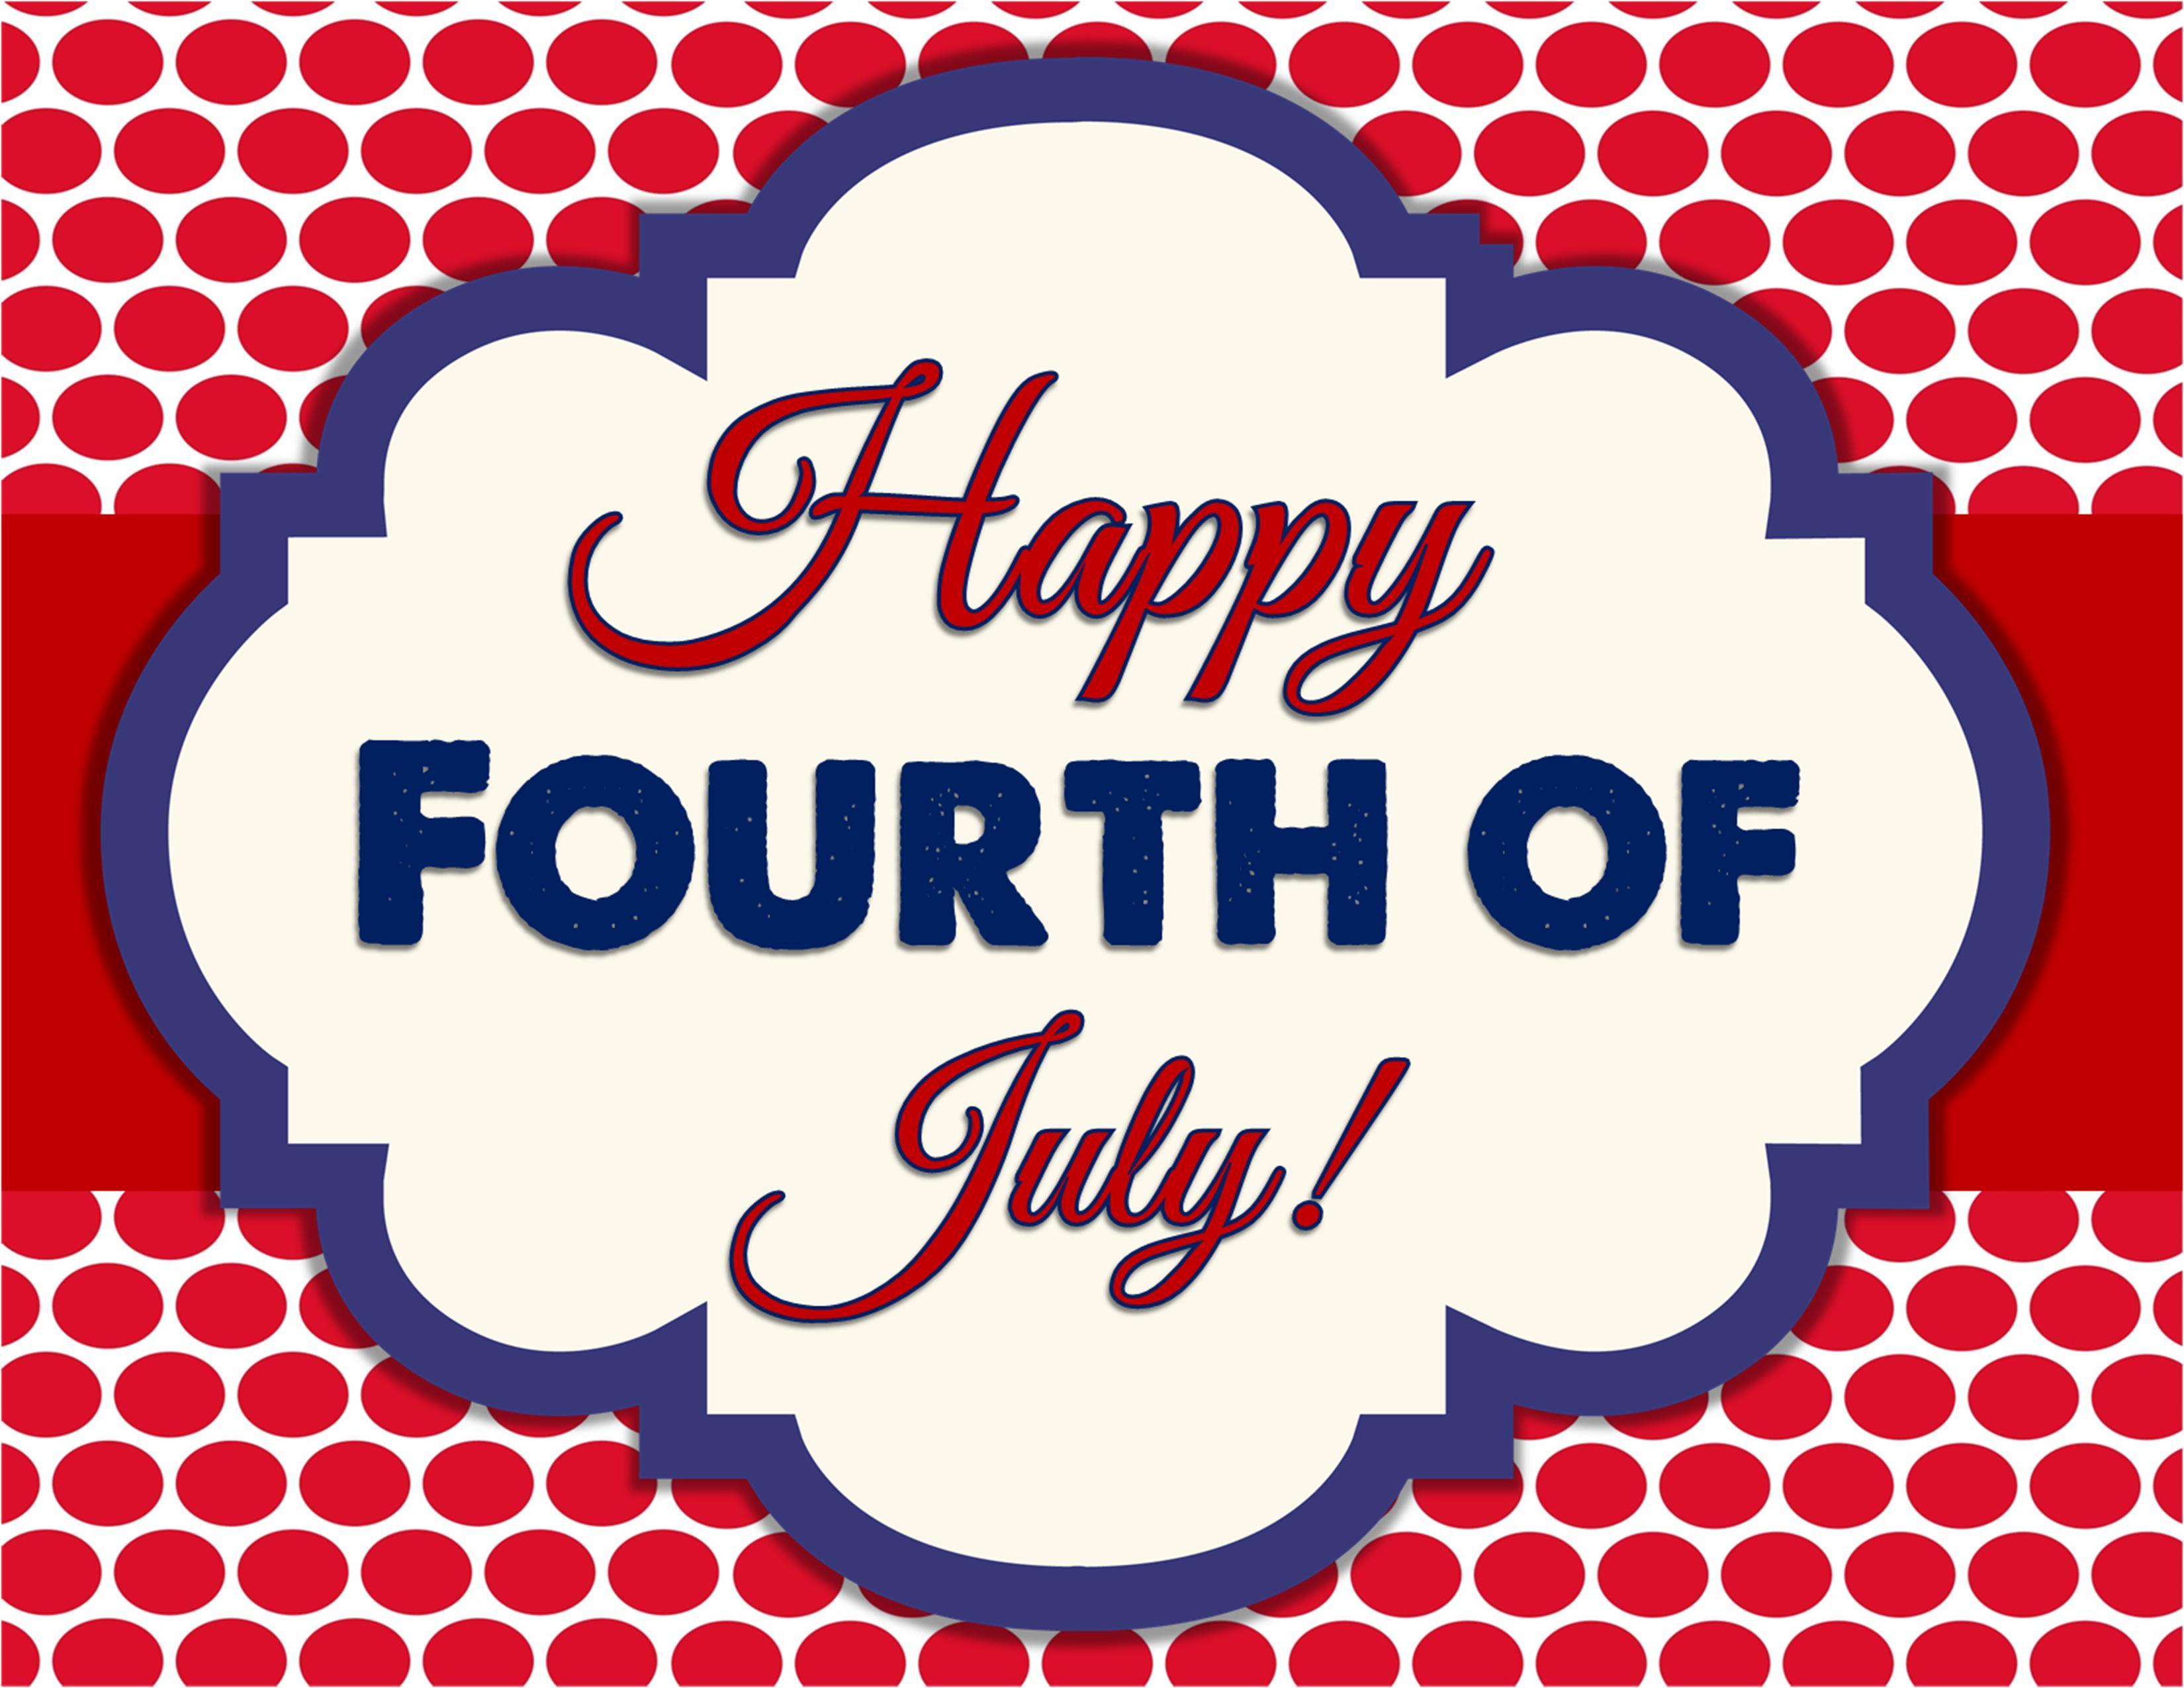 Celebrating July 4th